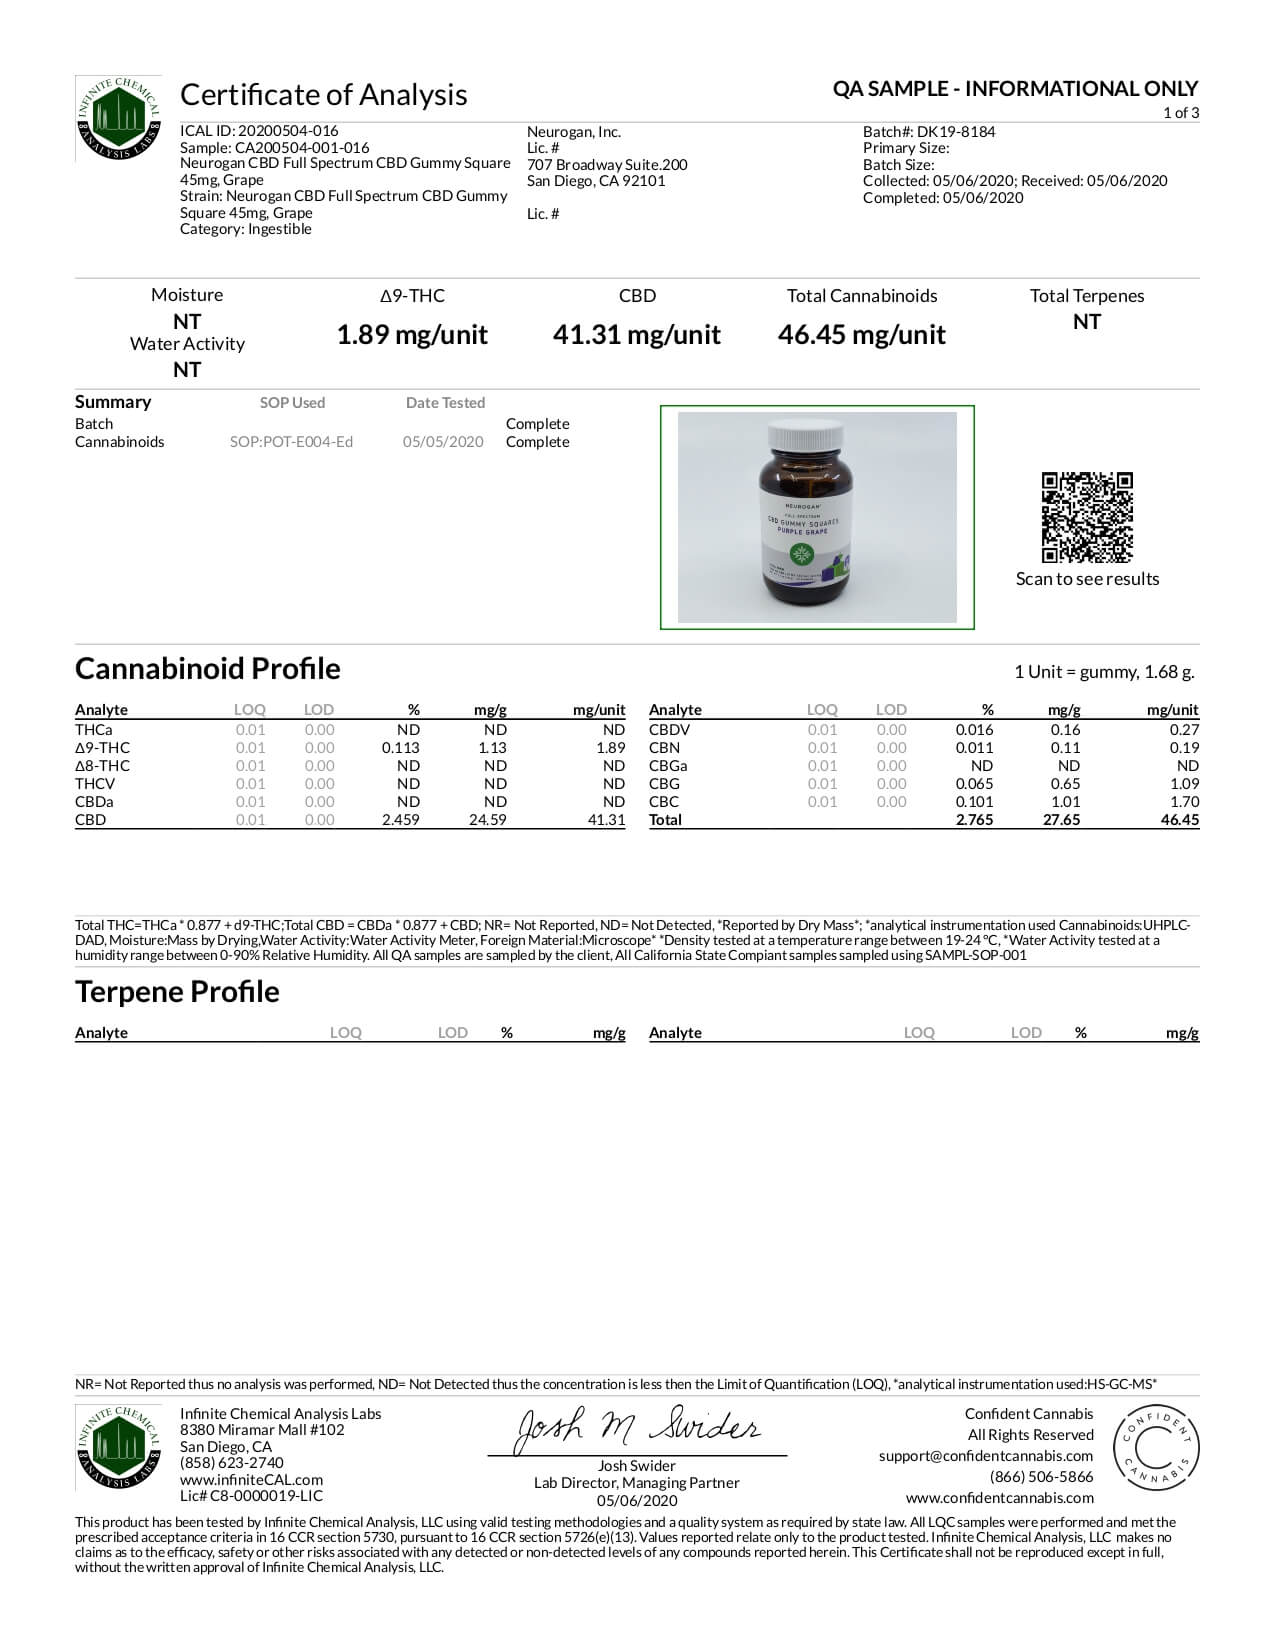 Neurogan, Inc. CBD Edible Full Spectrum Gummy Squares Purple Grape Lab Report